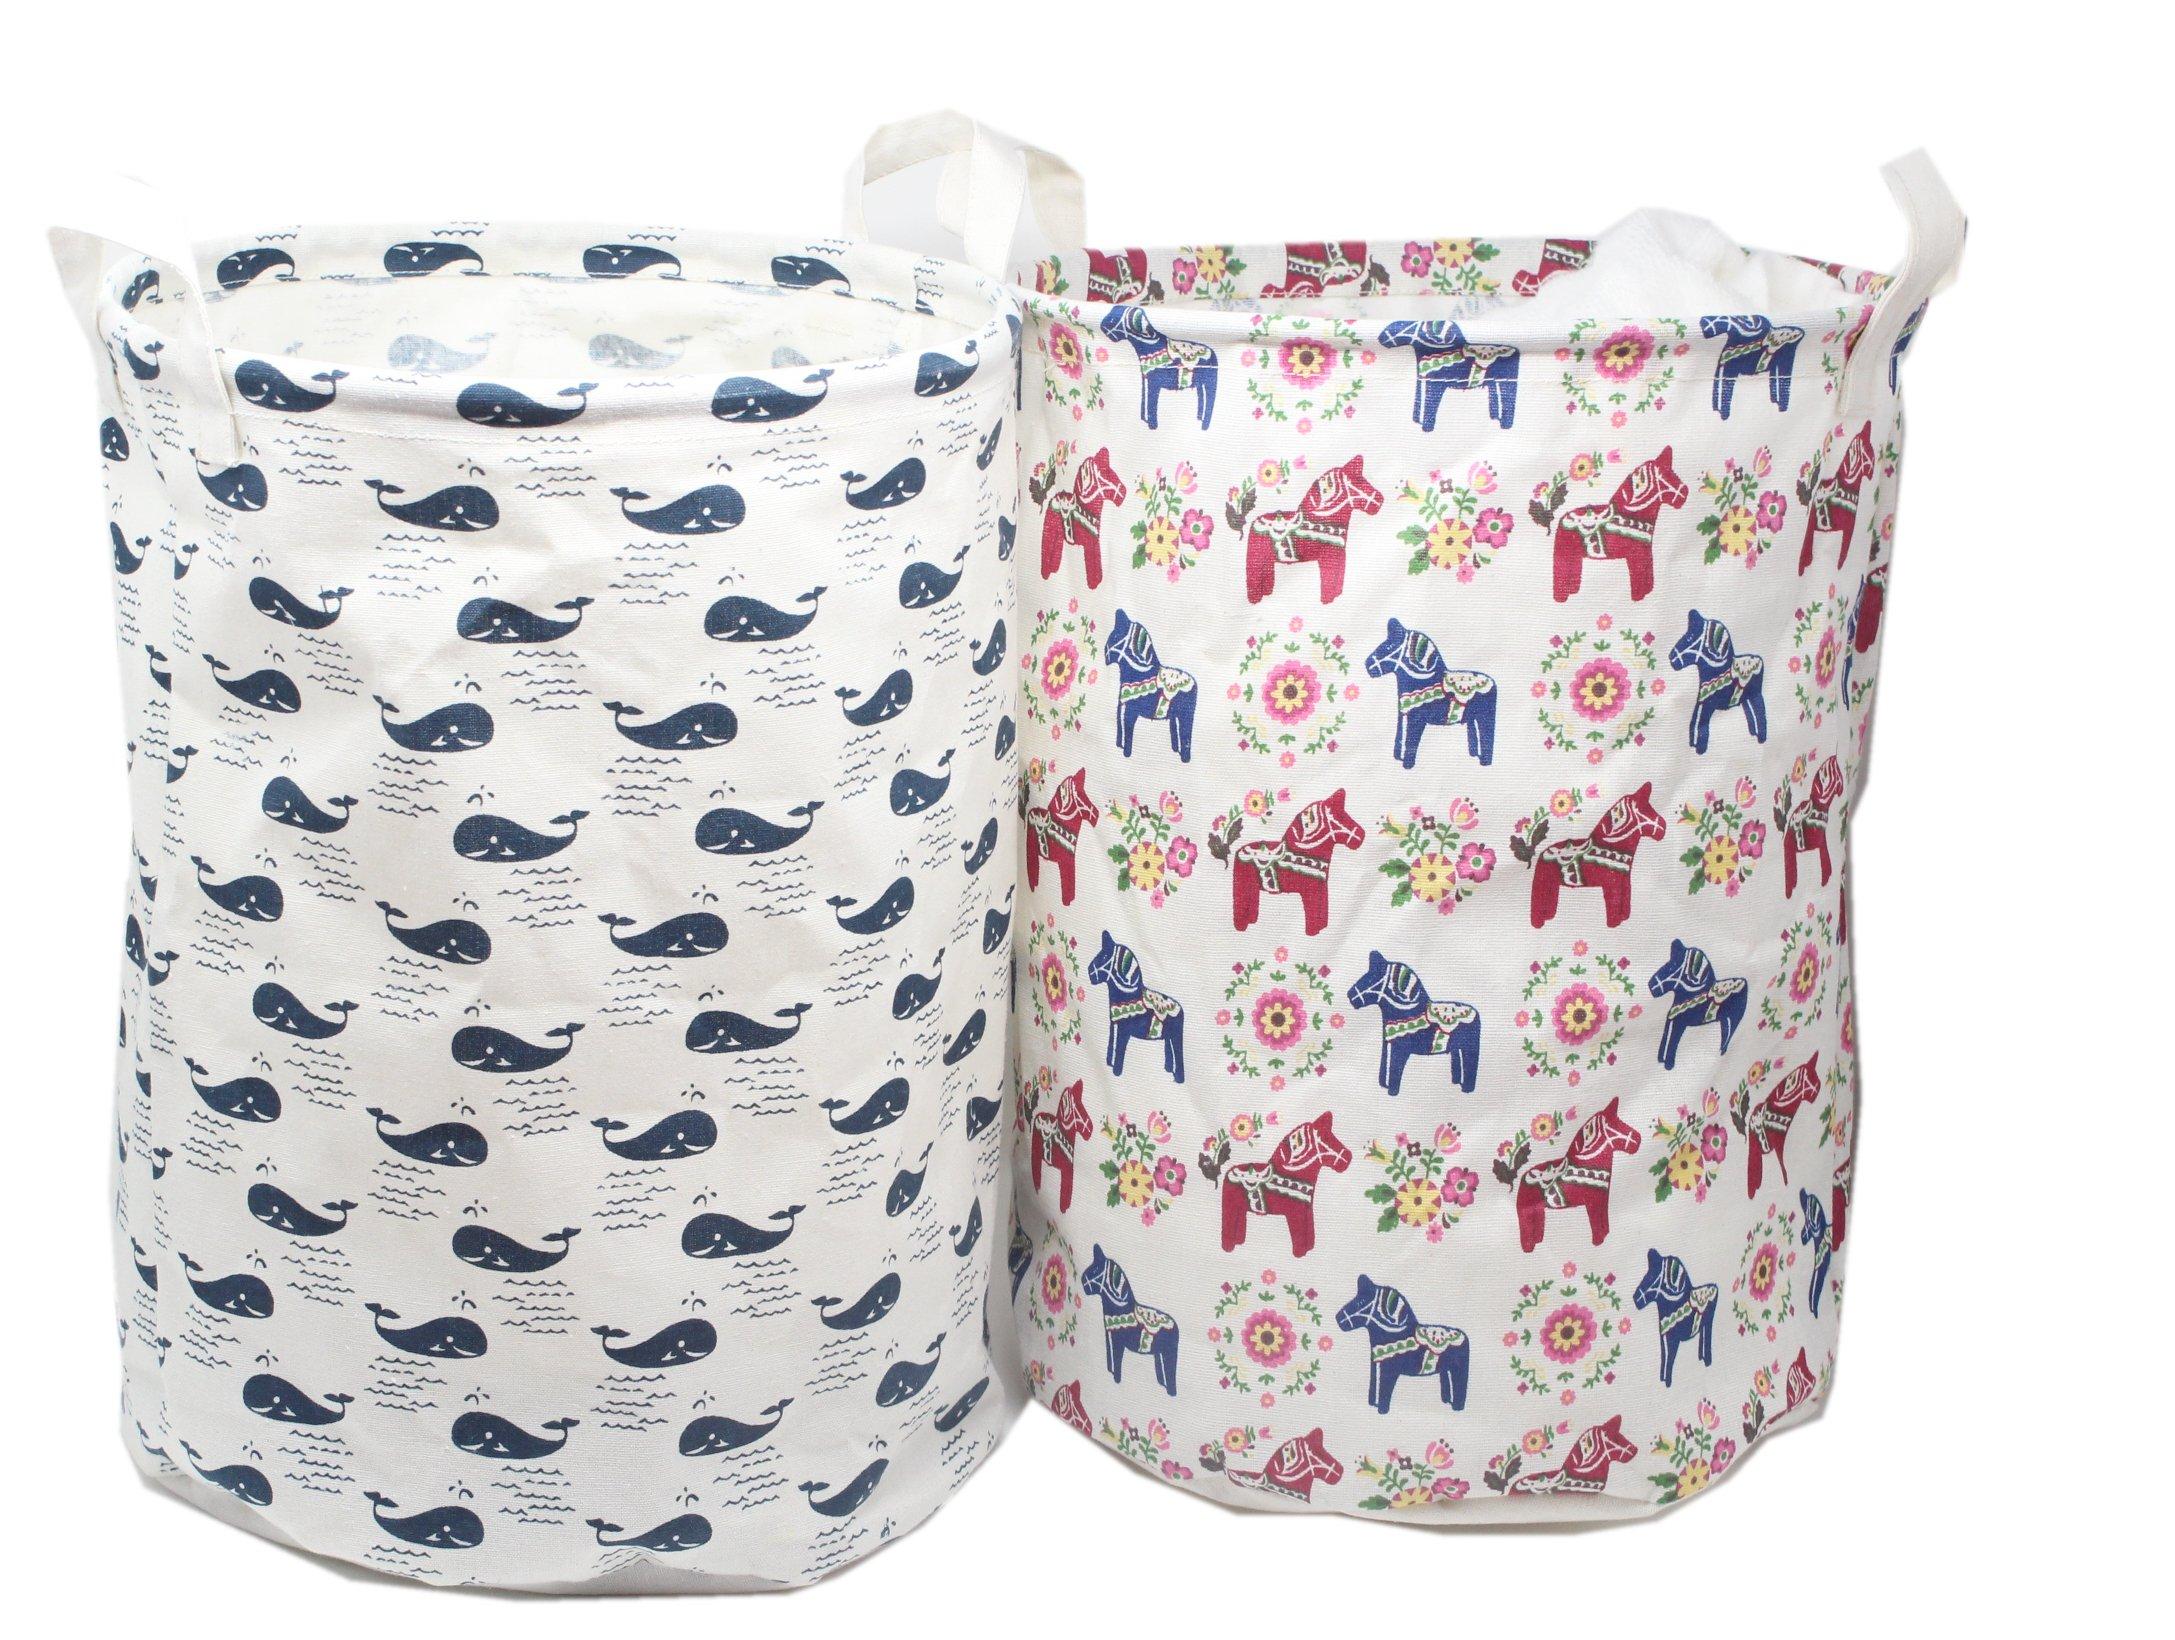 2-Pack Large Toy Storage Bins Dala Horse Fabric Cubes Kids Laundry Basket Nursery Hamper